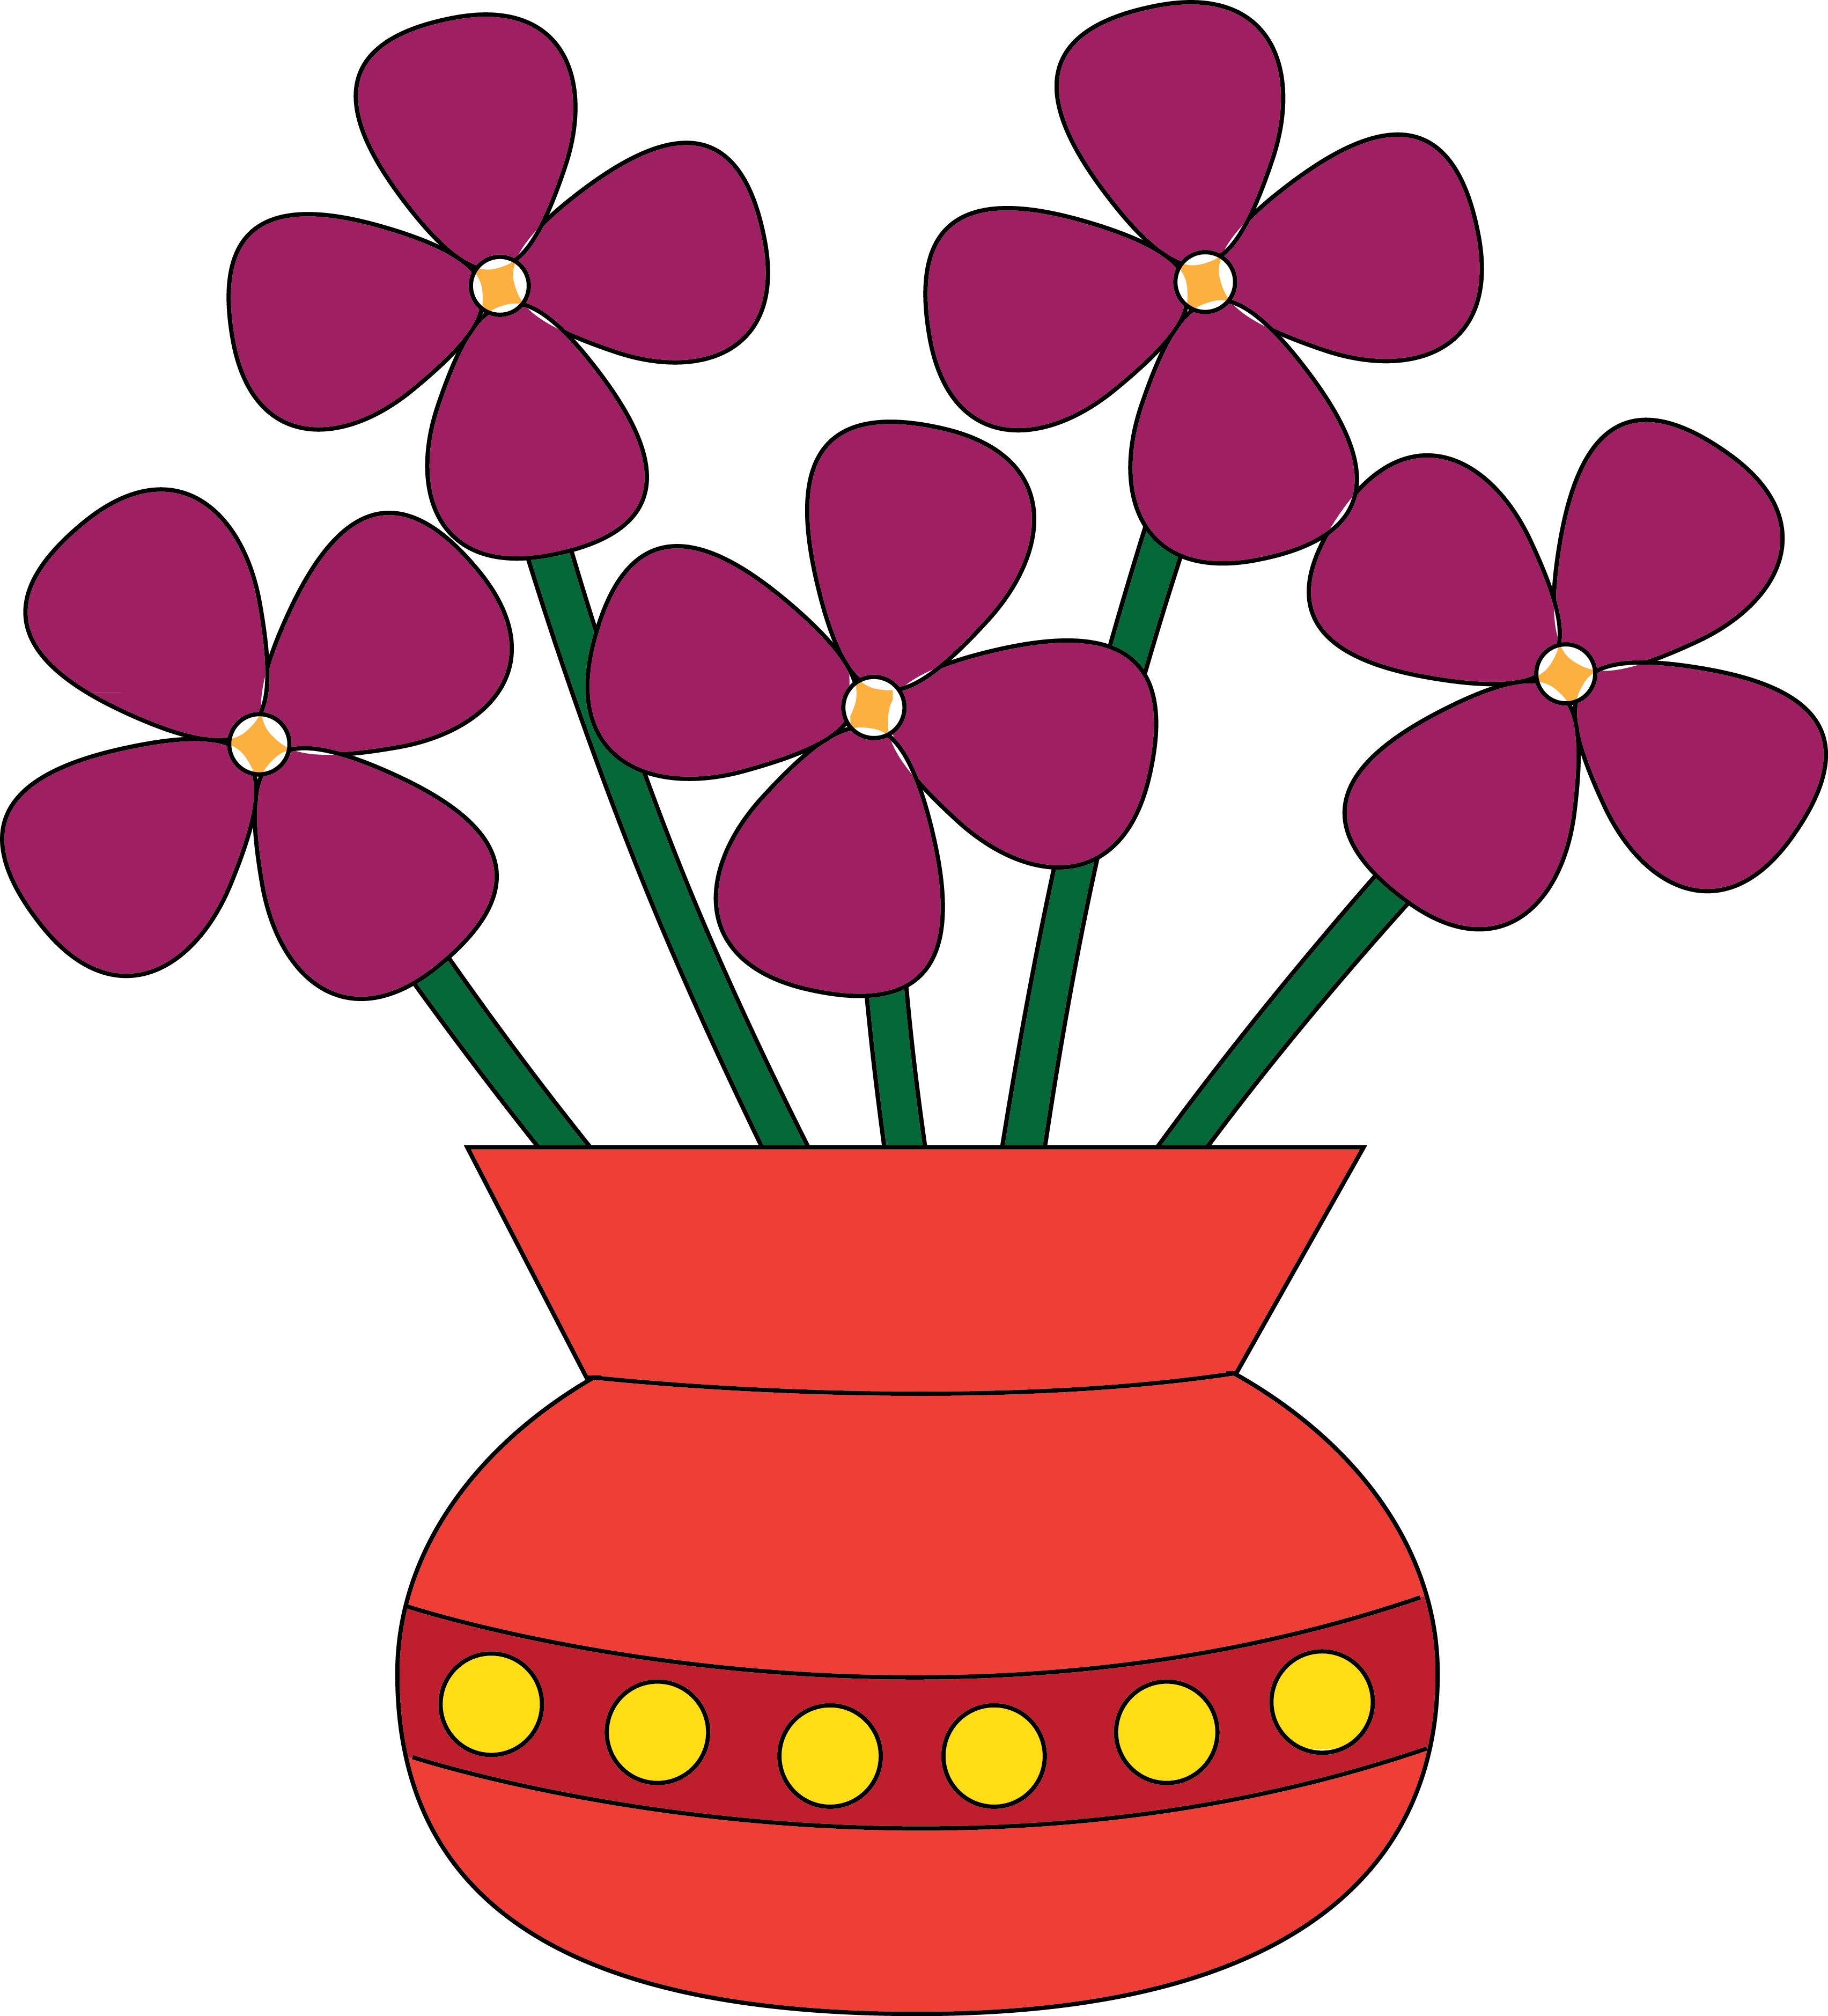 Drawn vase clipart Clipart Clipart Clipart Images